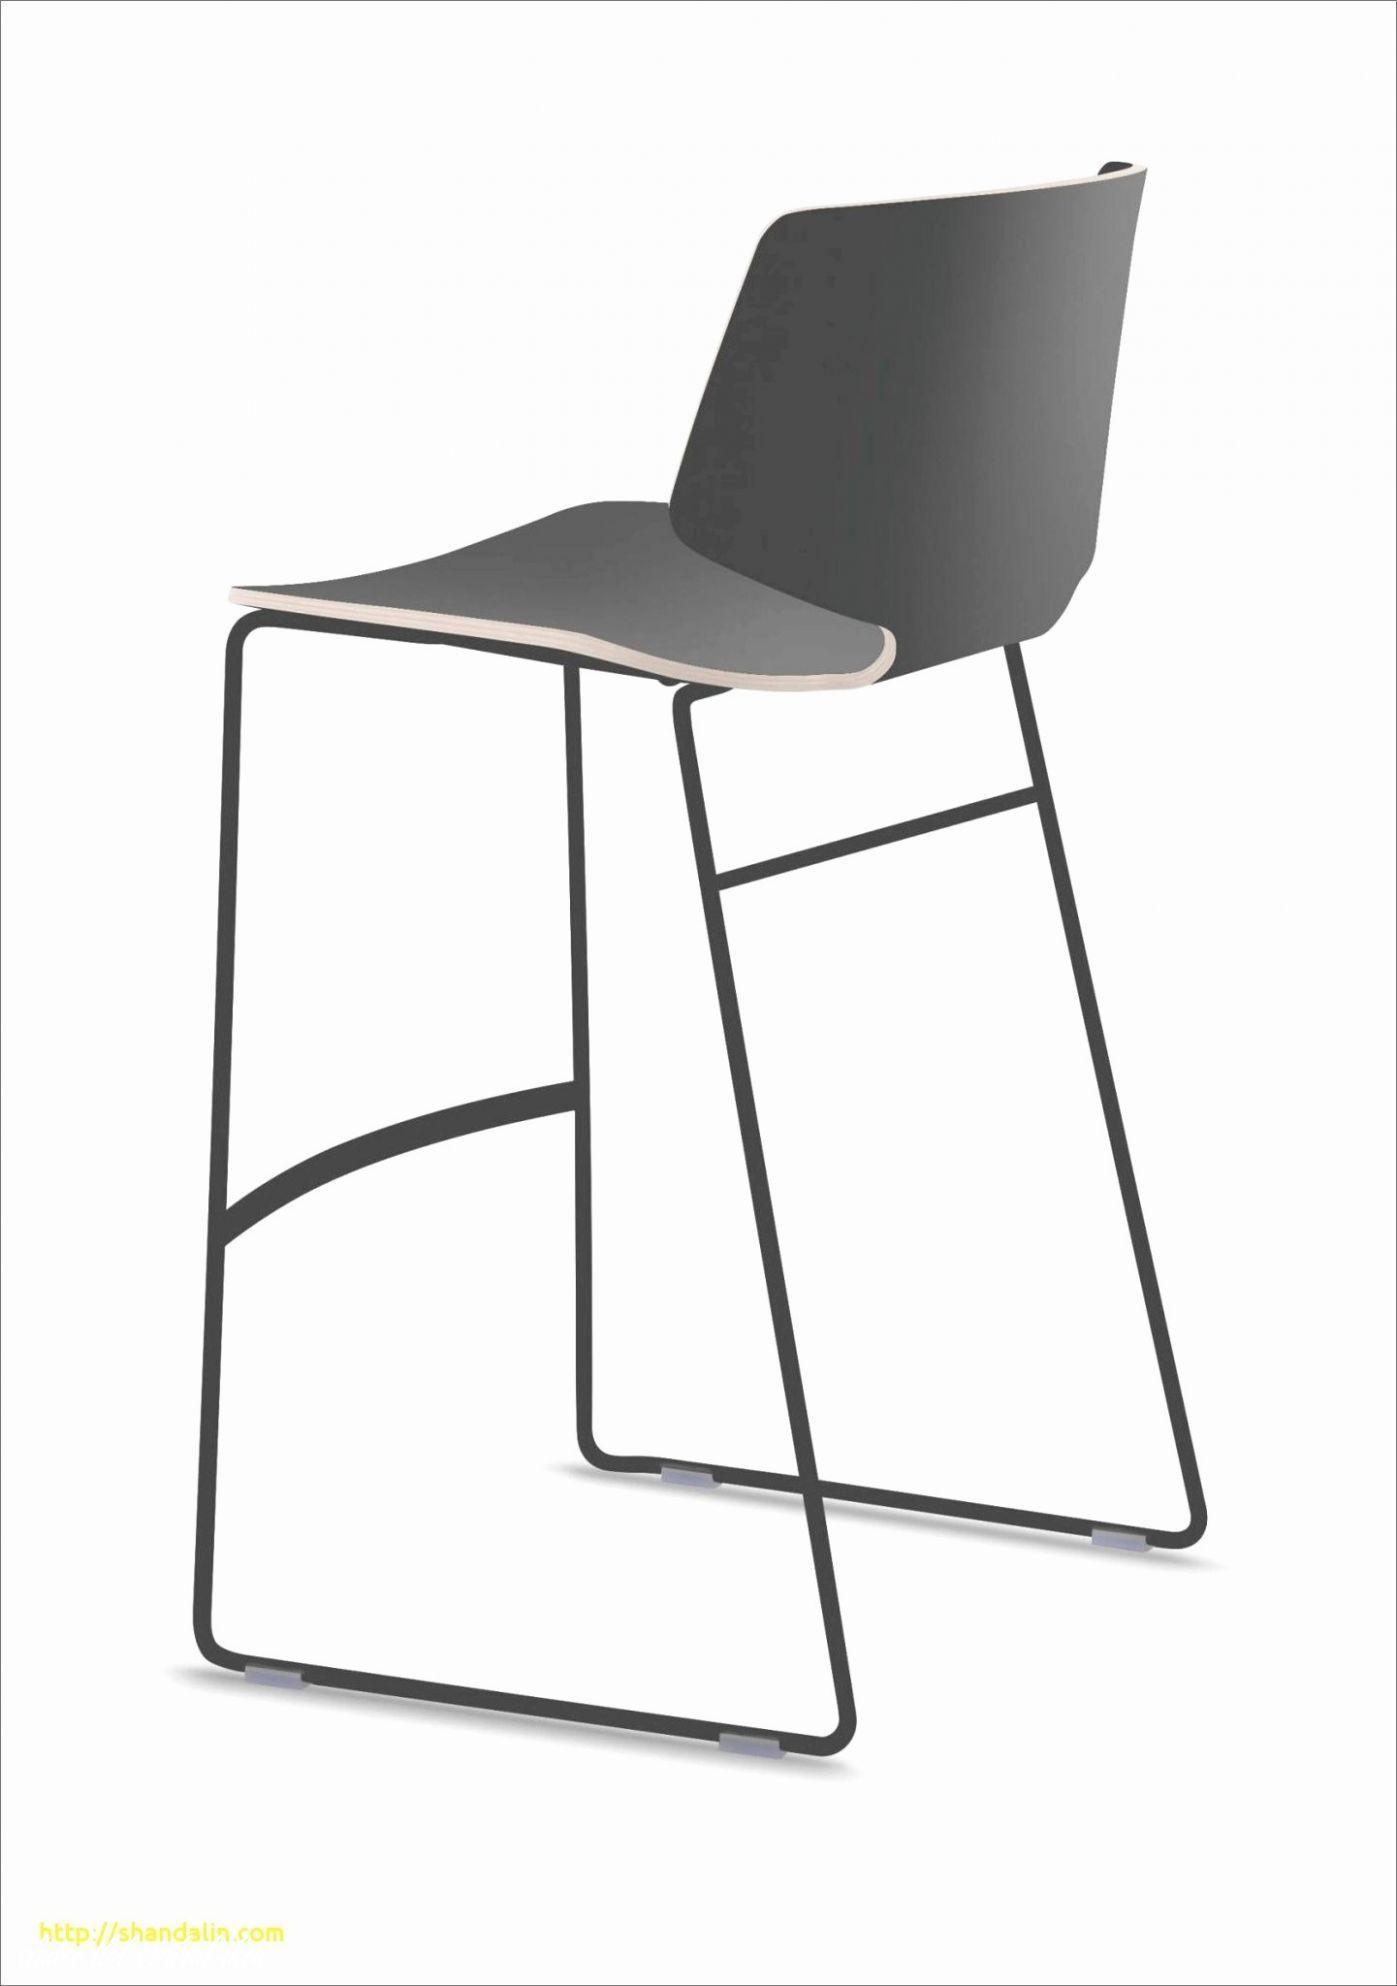 9 Meridienne Ilot Central Ikea Chaise Home Decor Alinea